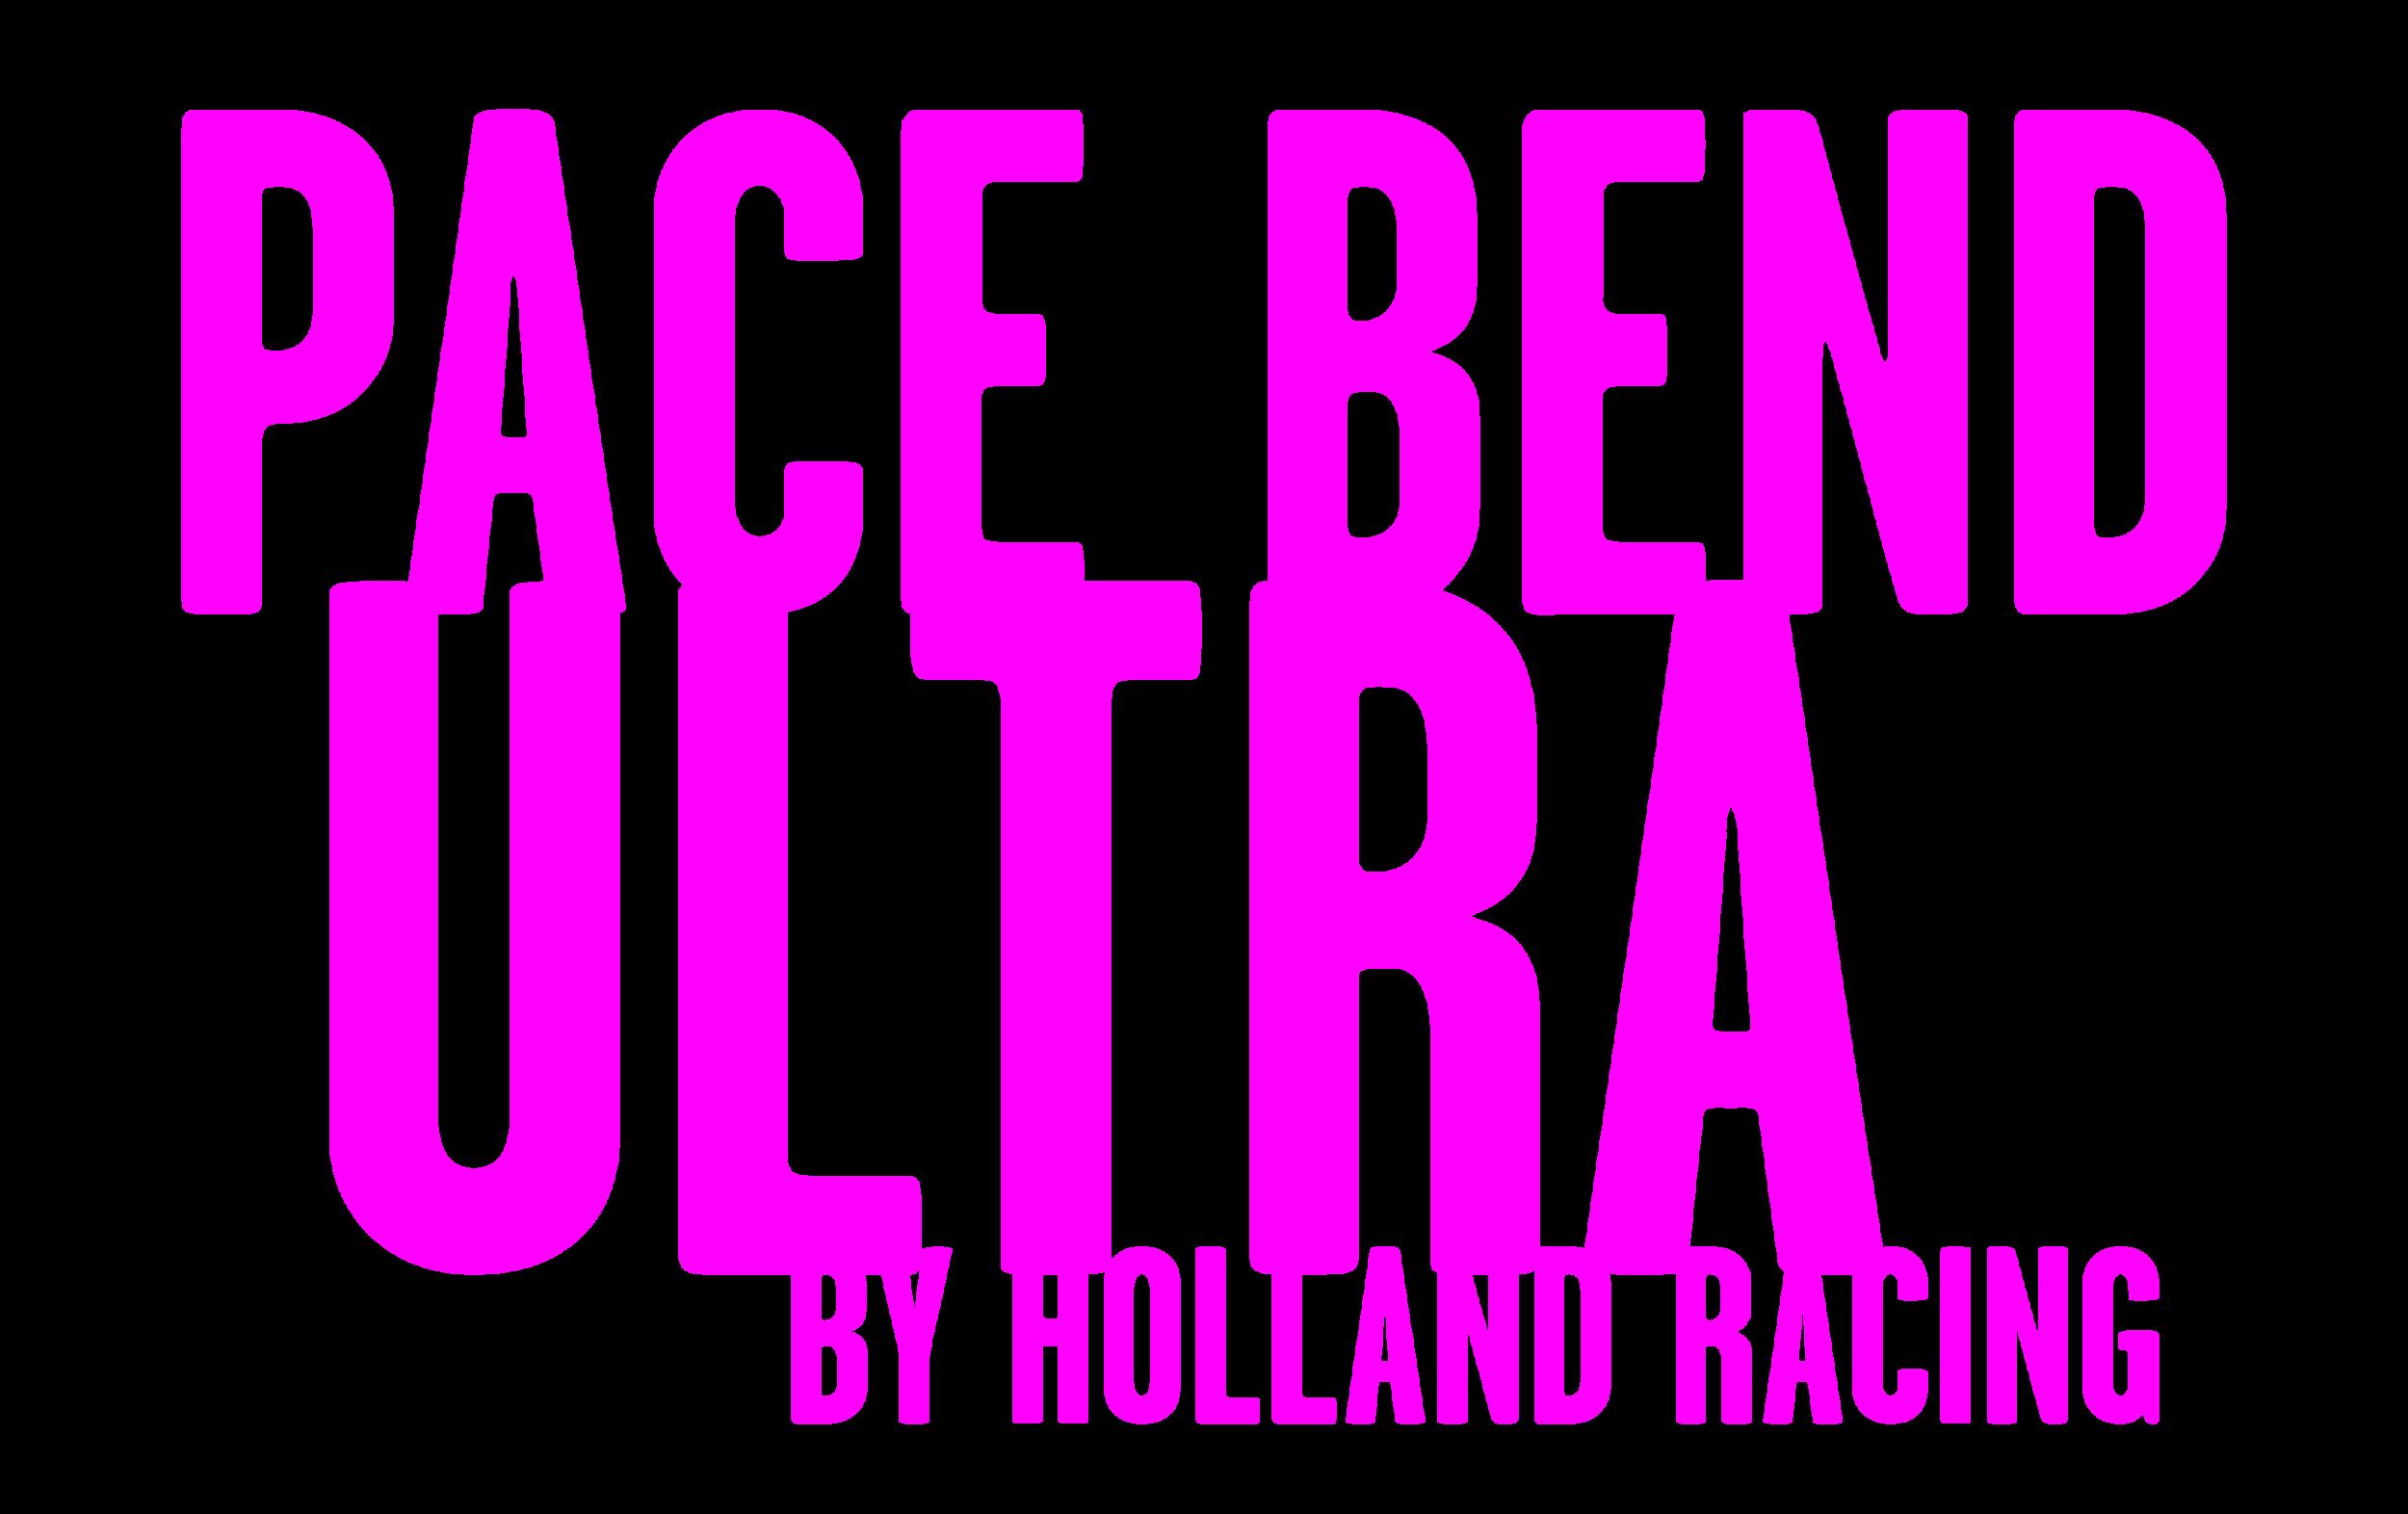 Feb 2-3, 2019 - 3 -6-12-24 Hour Races